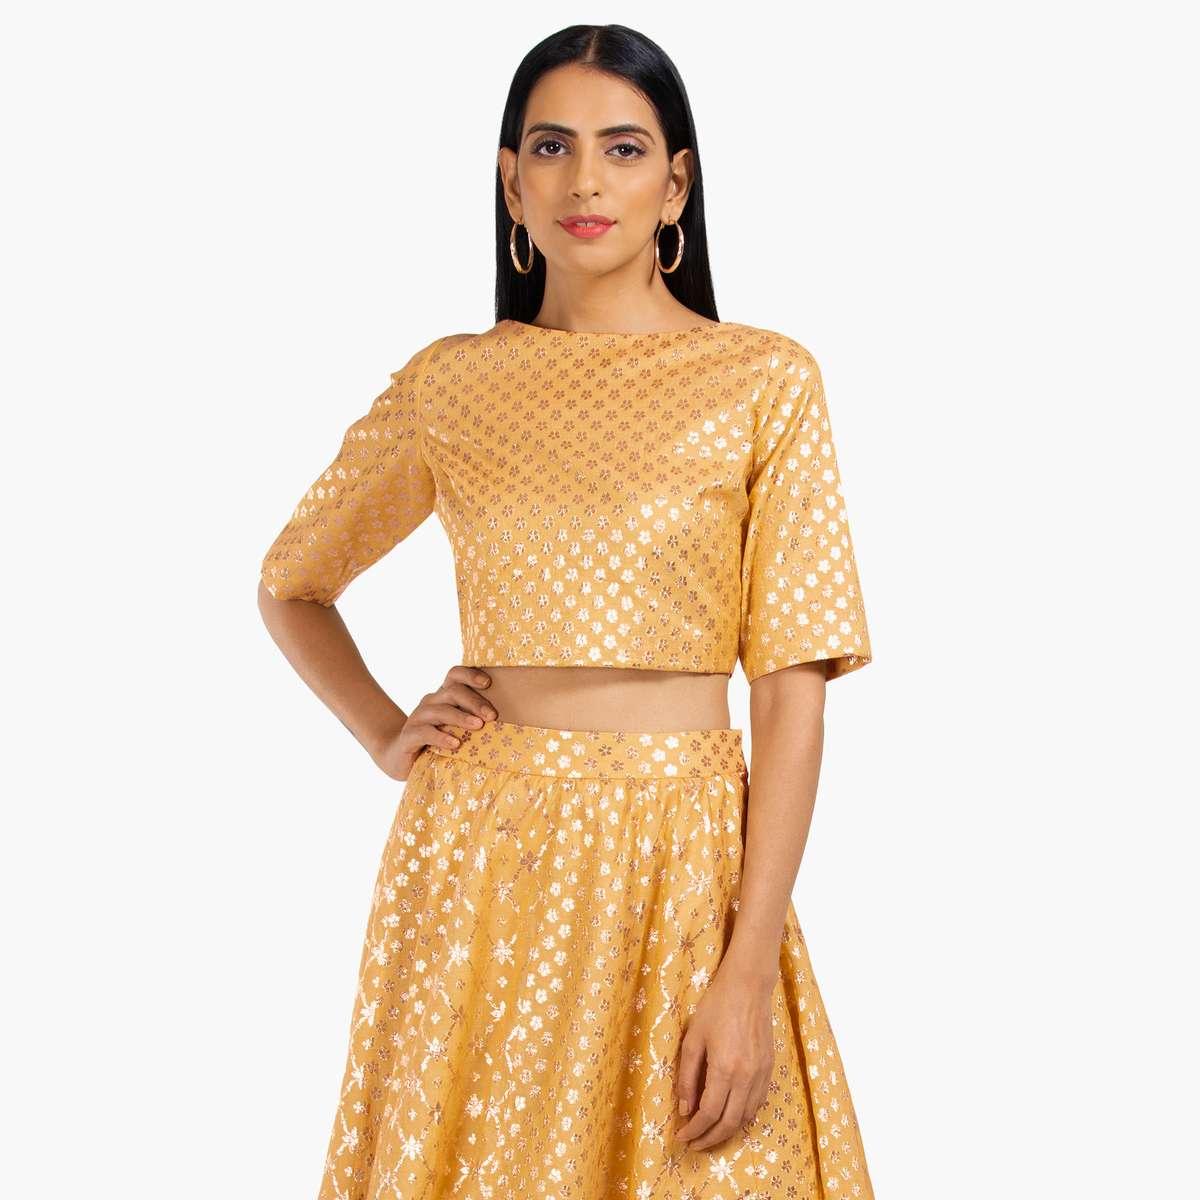 3.INDYA Embroidered Short Sleeves Crop Top